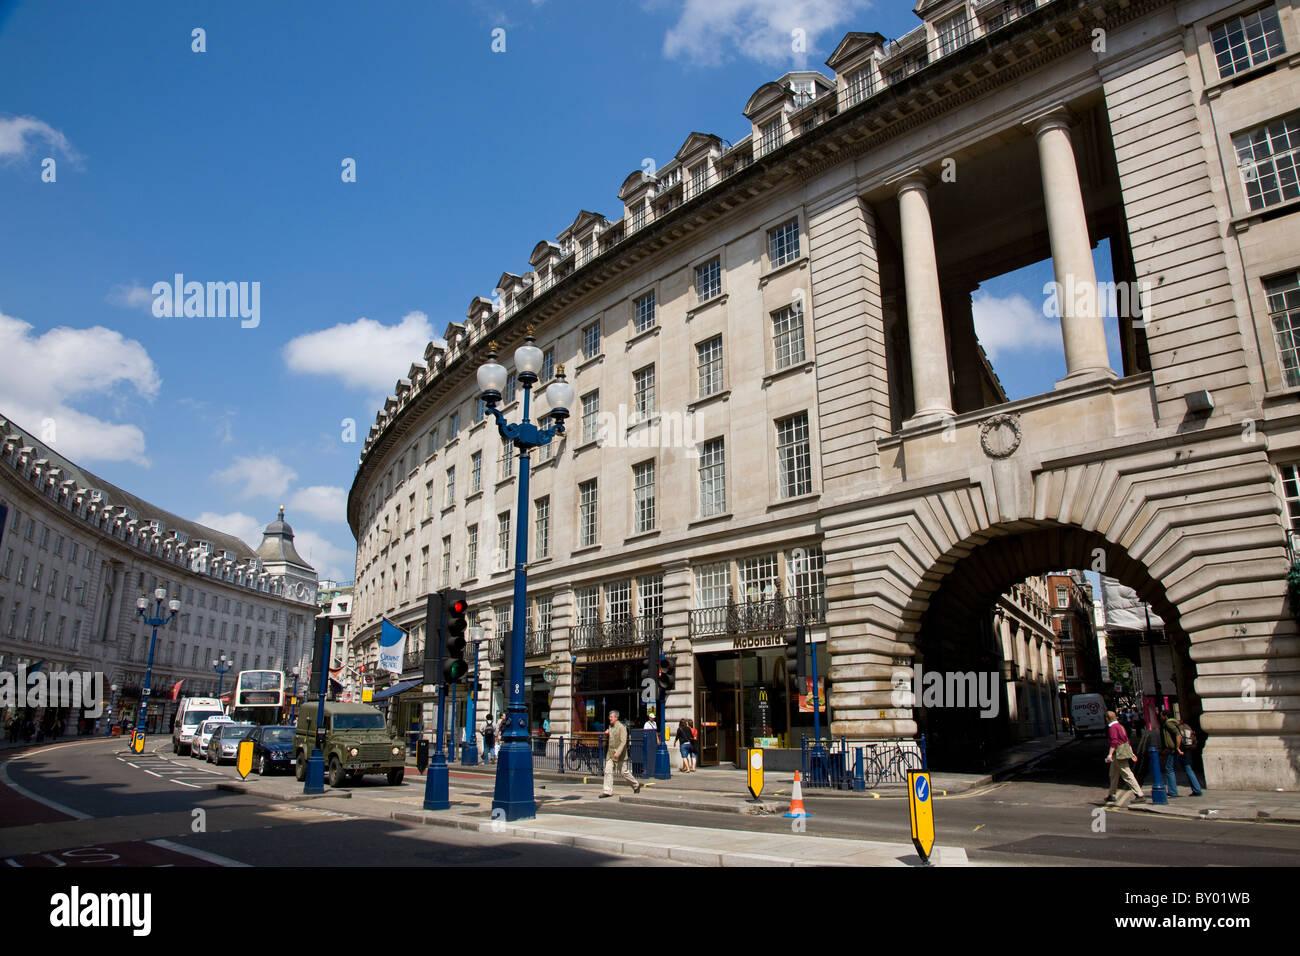 Regents Street Stock Photo